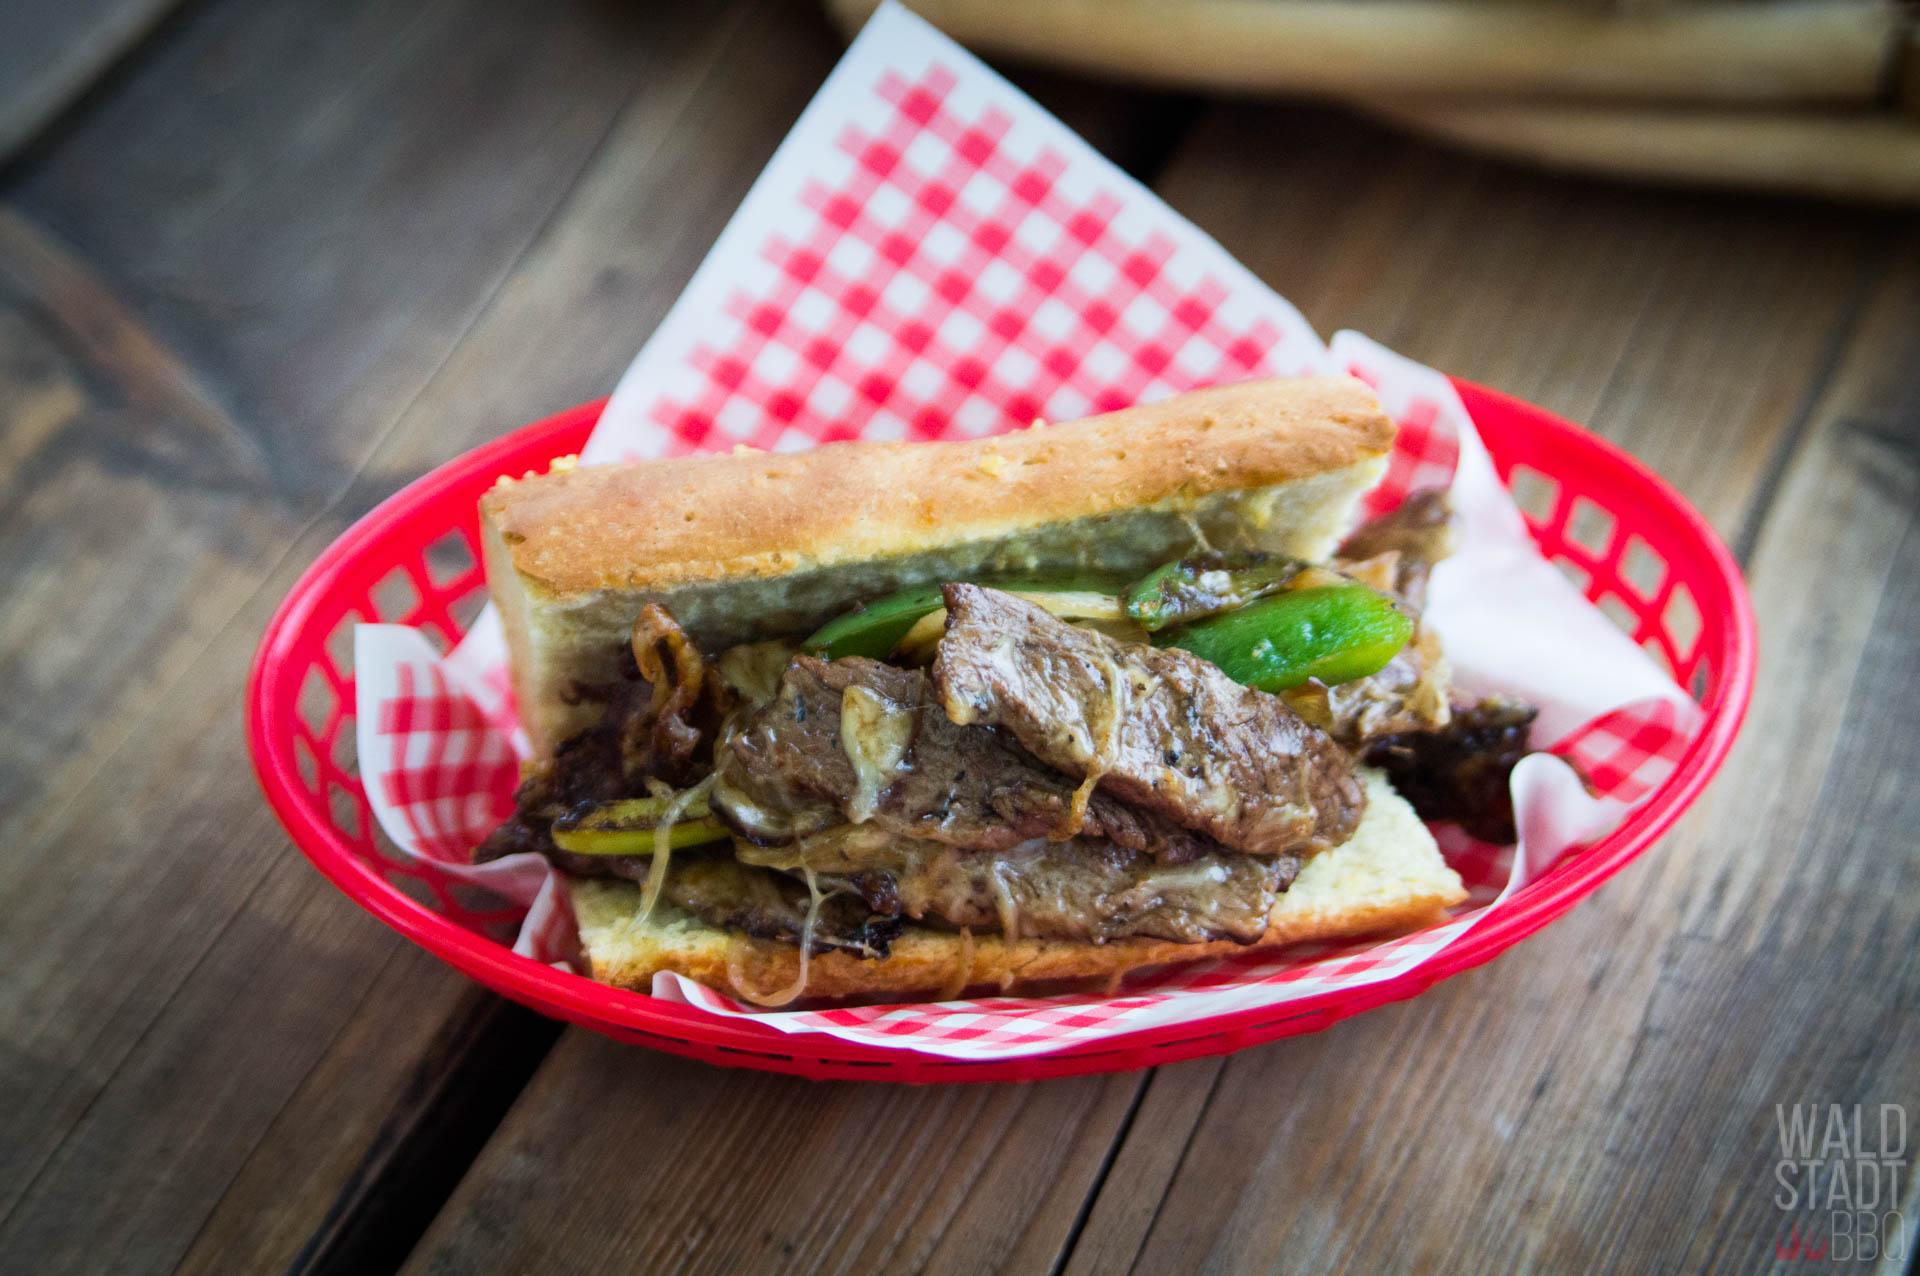 Philly Cheese Steak Sandwich - Rezept in Kooperation mit Don Carne (Silvester 2018)